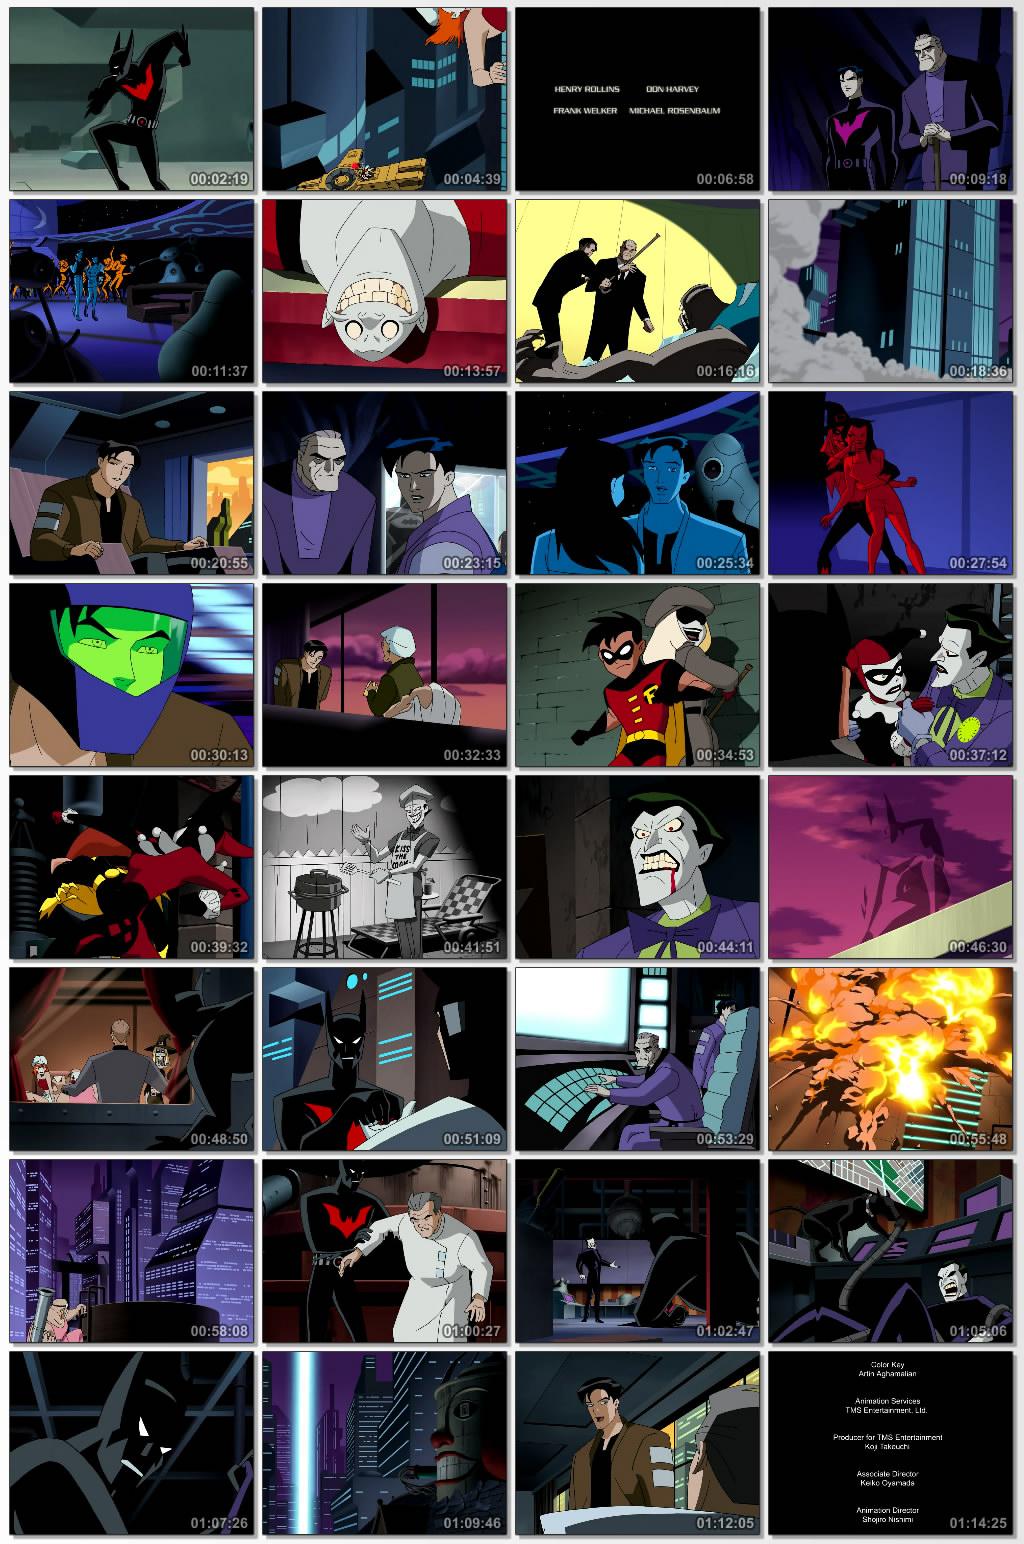 دانلود انیمیشن کارتونی Batman Beyond Return of the Joker 2000